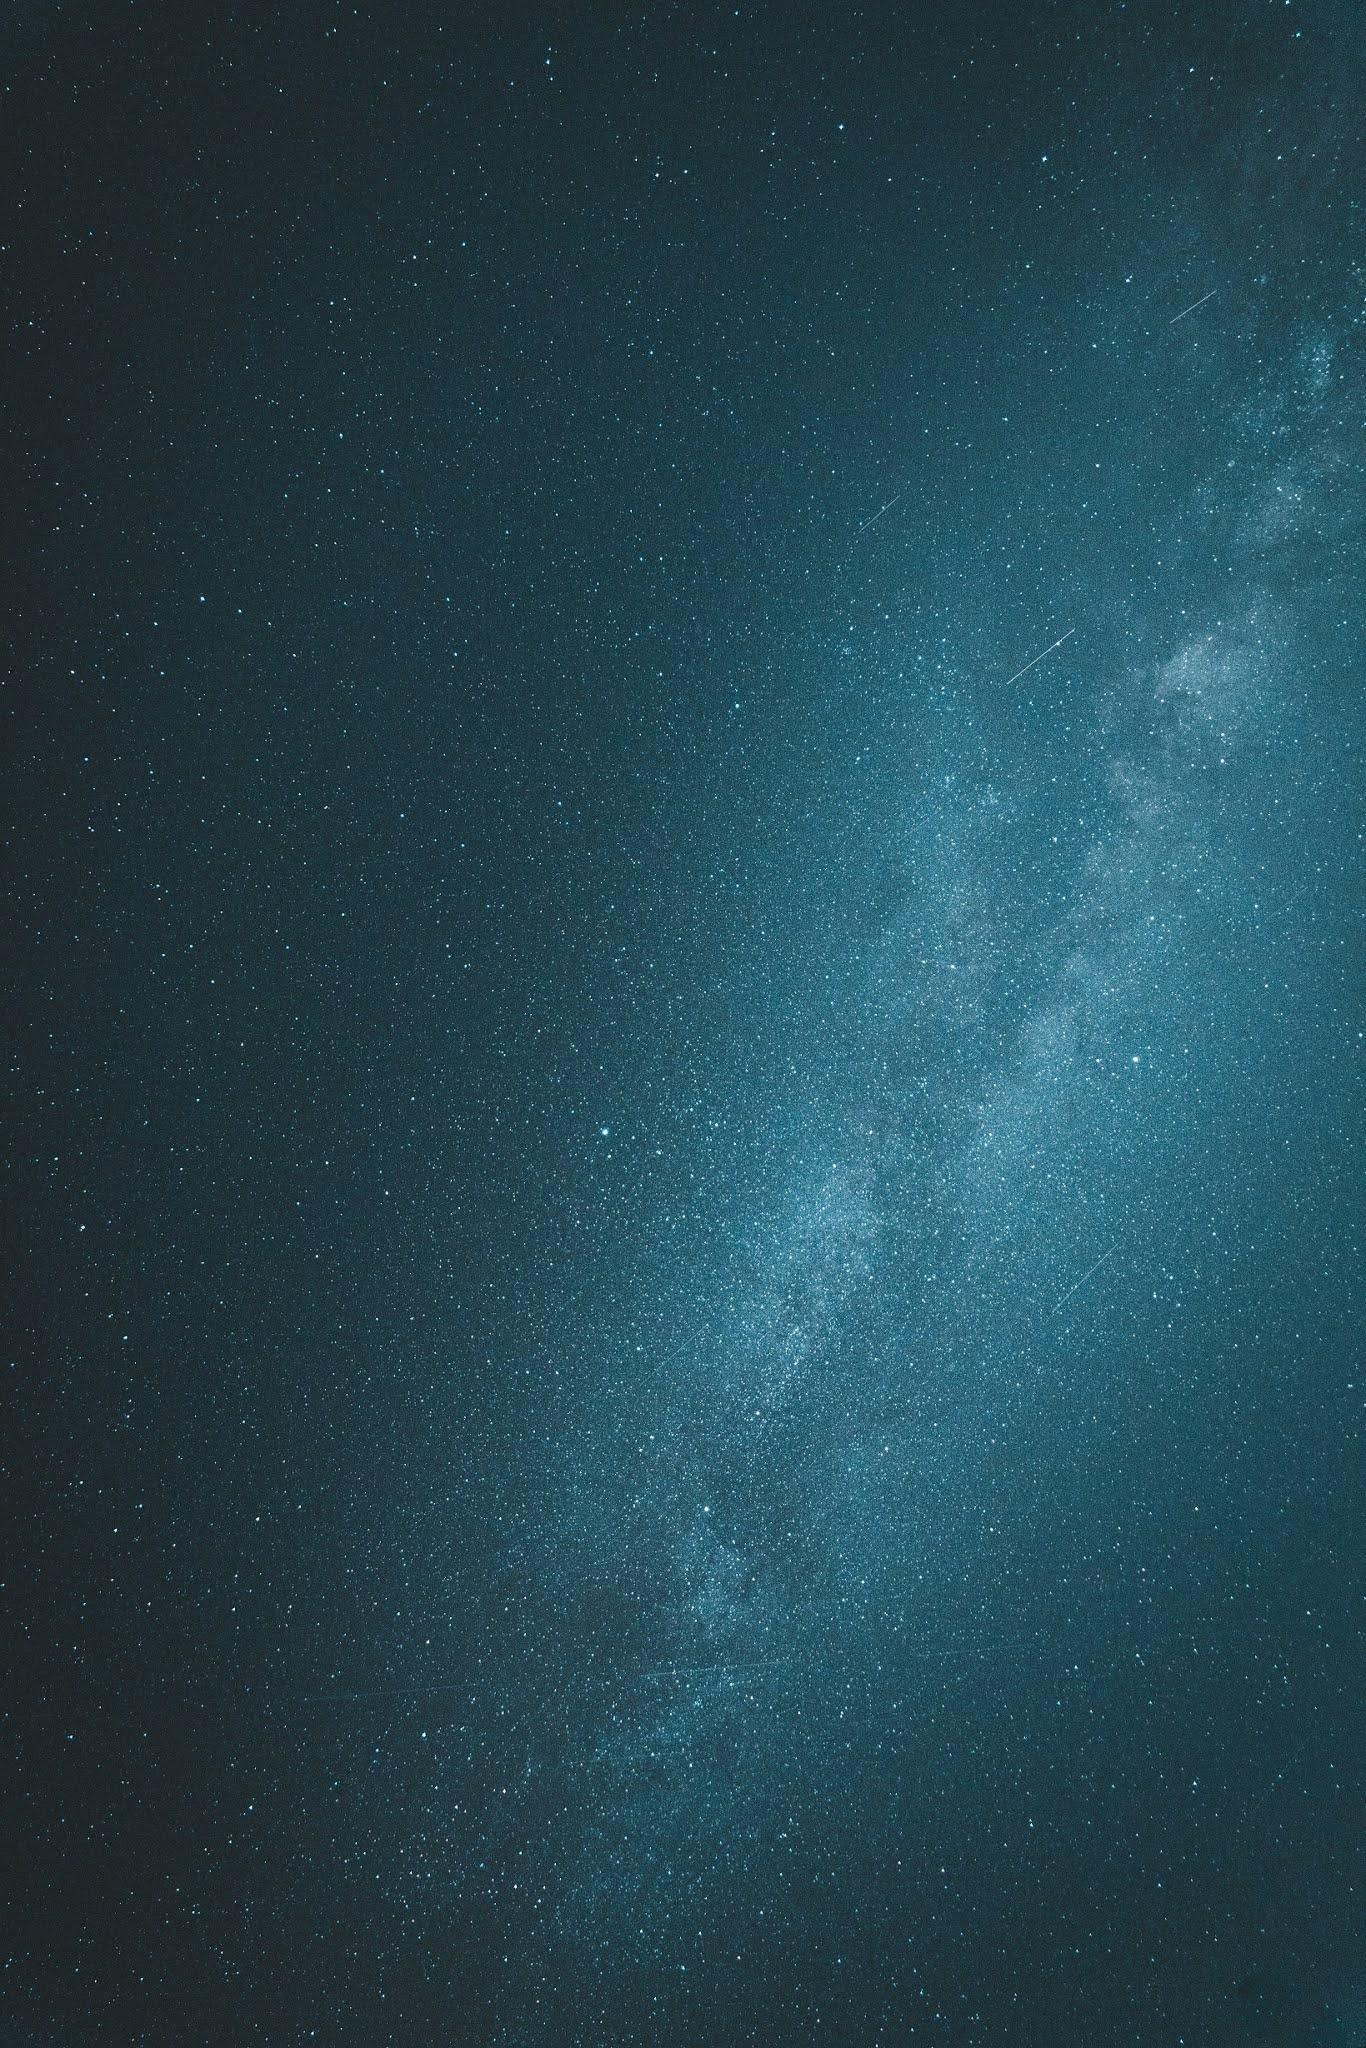 night stars, stars